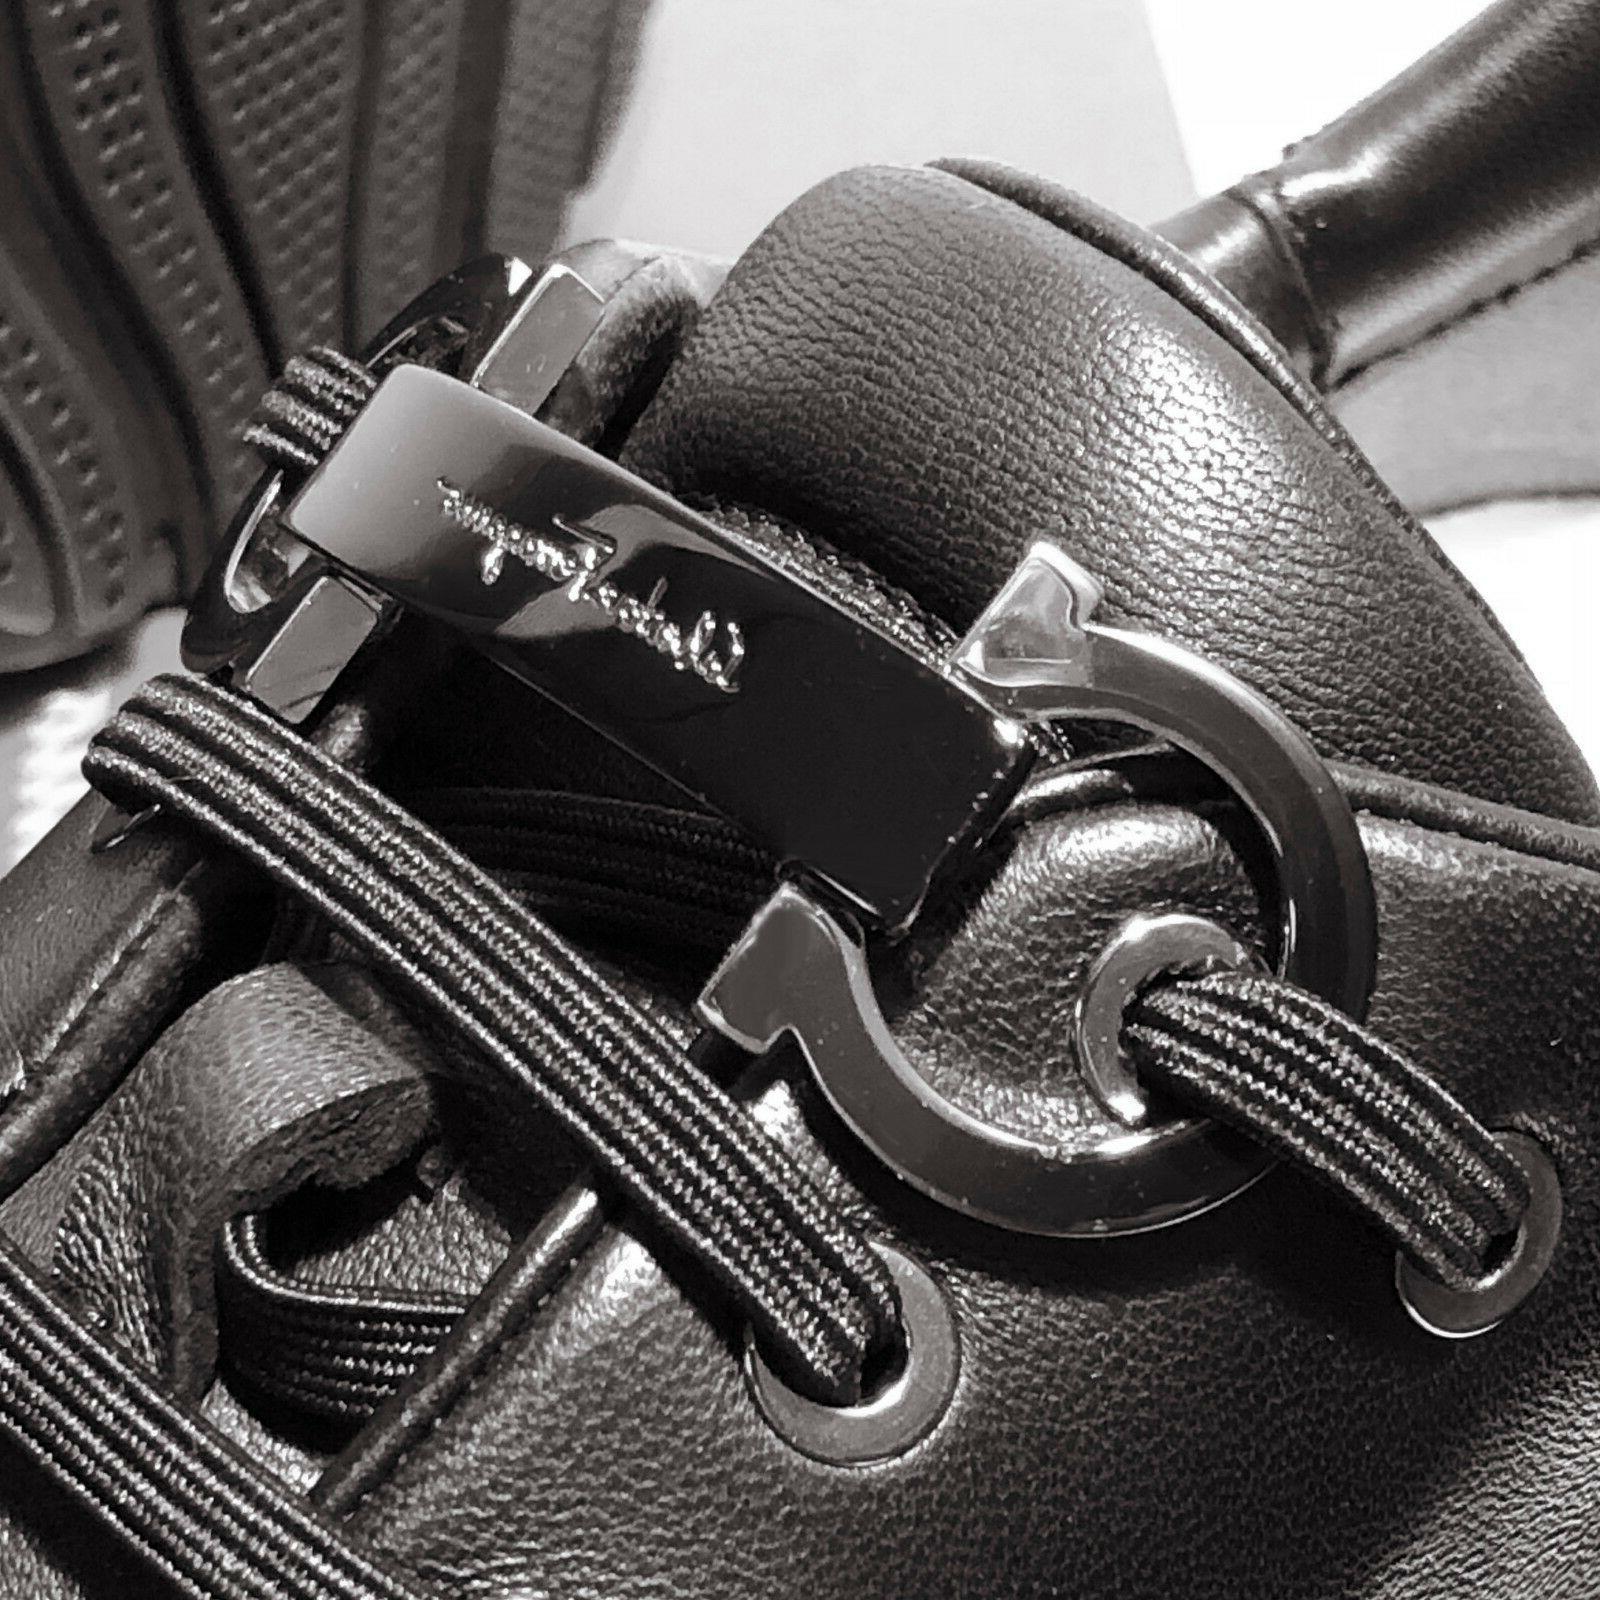 NIB Ferragamo Gancini FLUSHING Sneakers Men's Nappa Leather